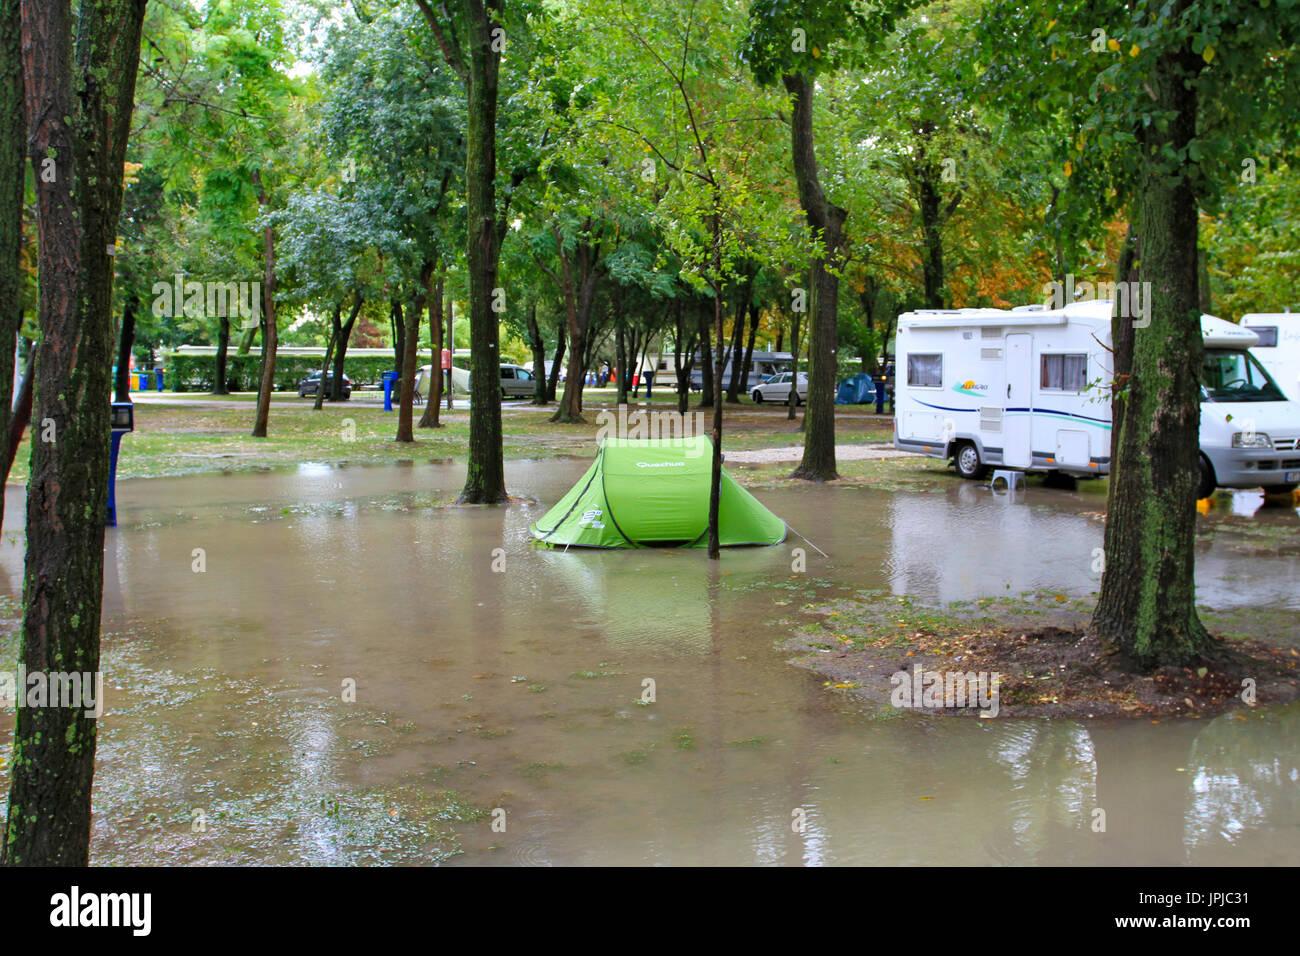 Campingplatz in der nähe